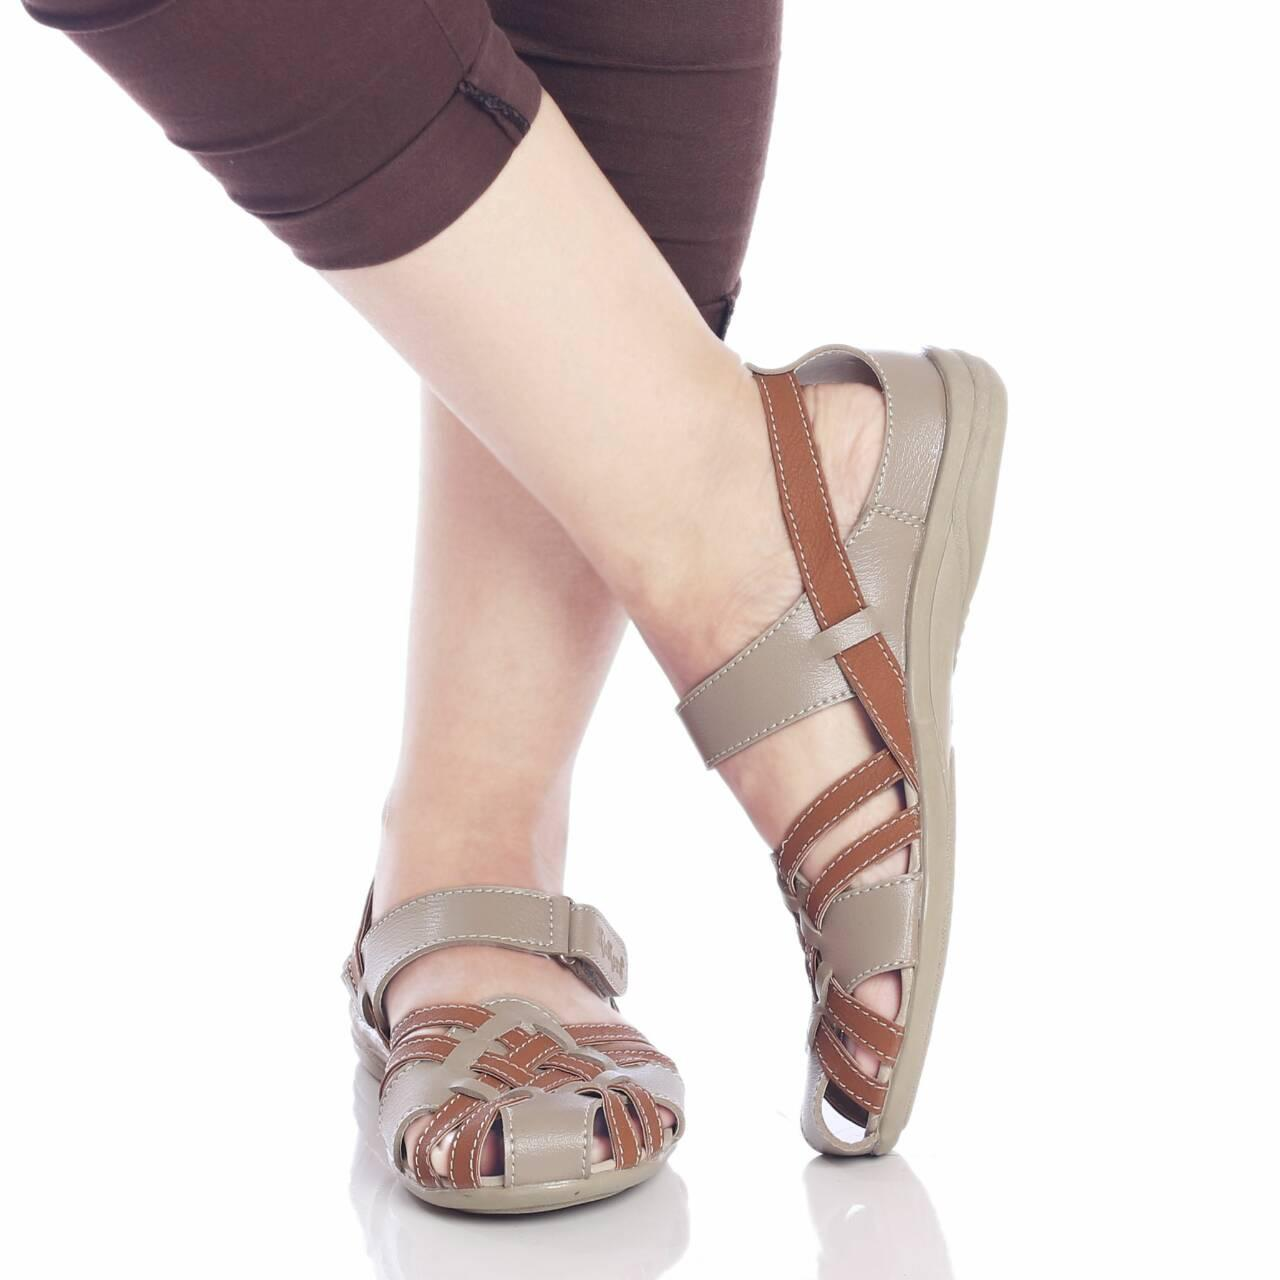 Promo sepatu sandal murah wanita cewek KICKERS grosir Fashion